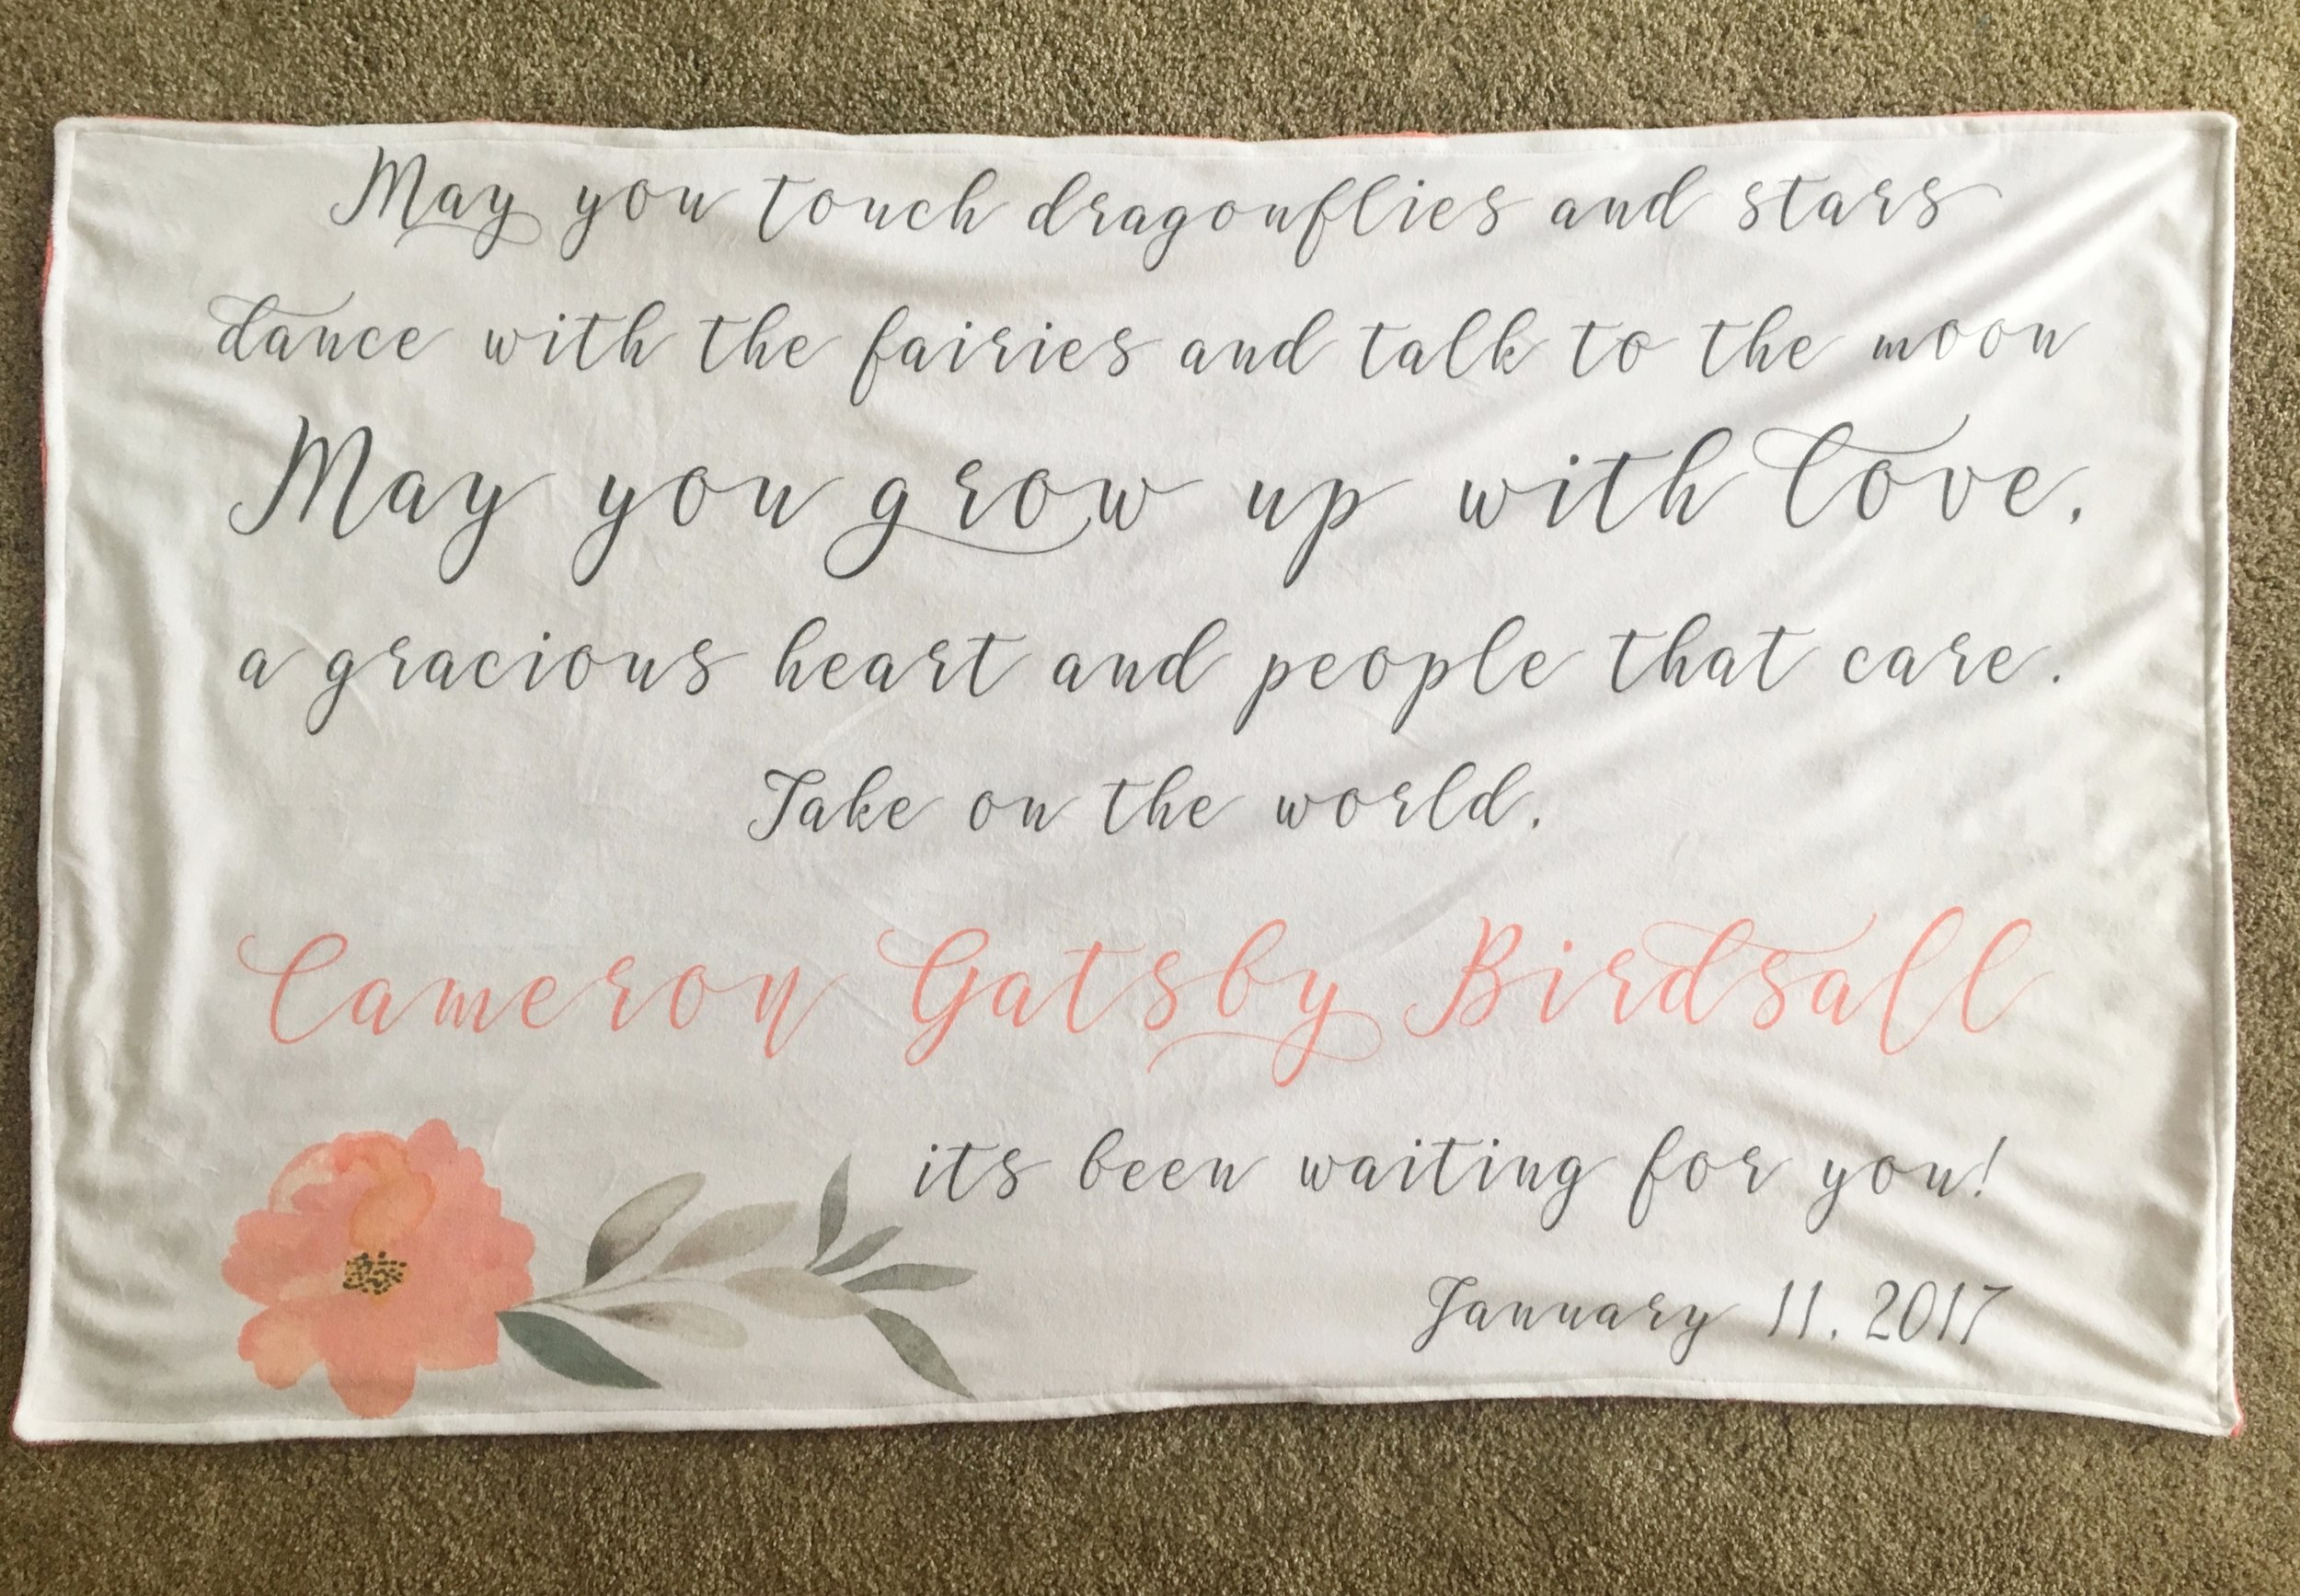 Central PA, Baby Blanket, Hand lettered, JesSmith Designs, Invitations, custom-03-29 10.44.06.jpg